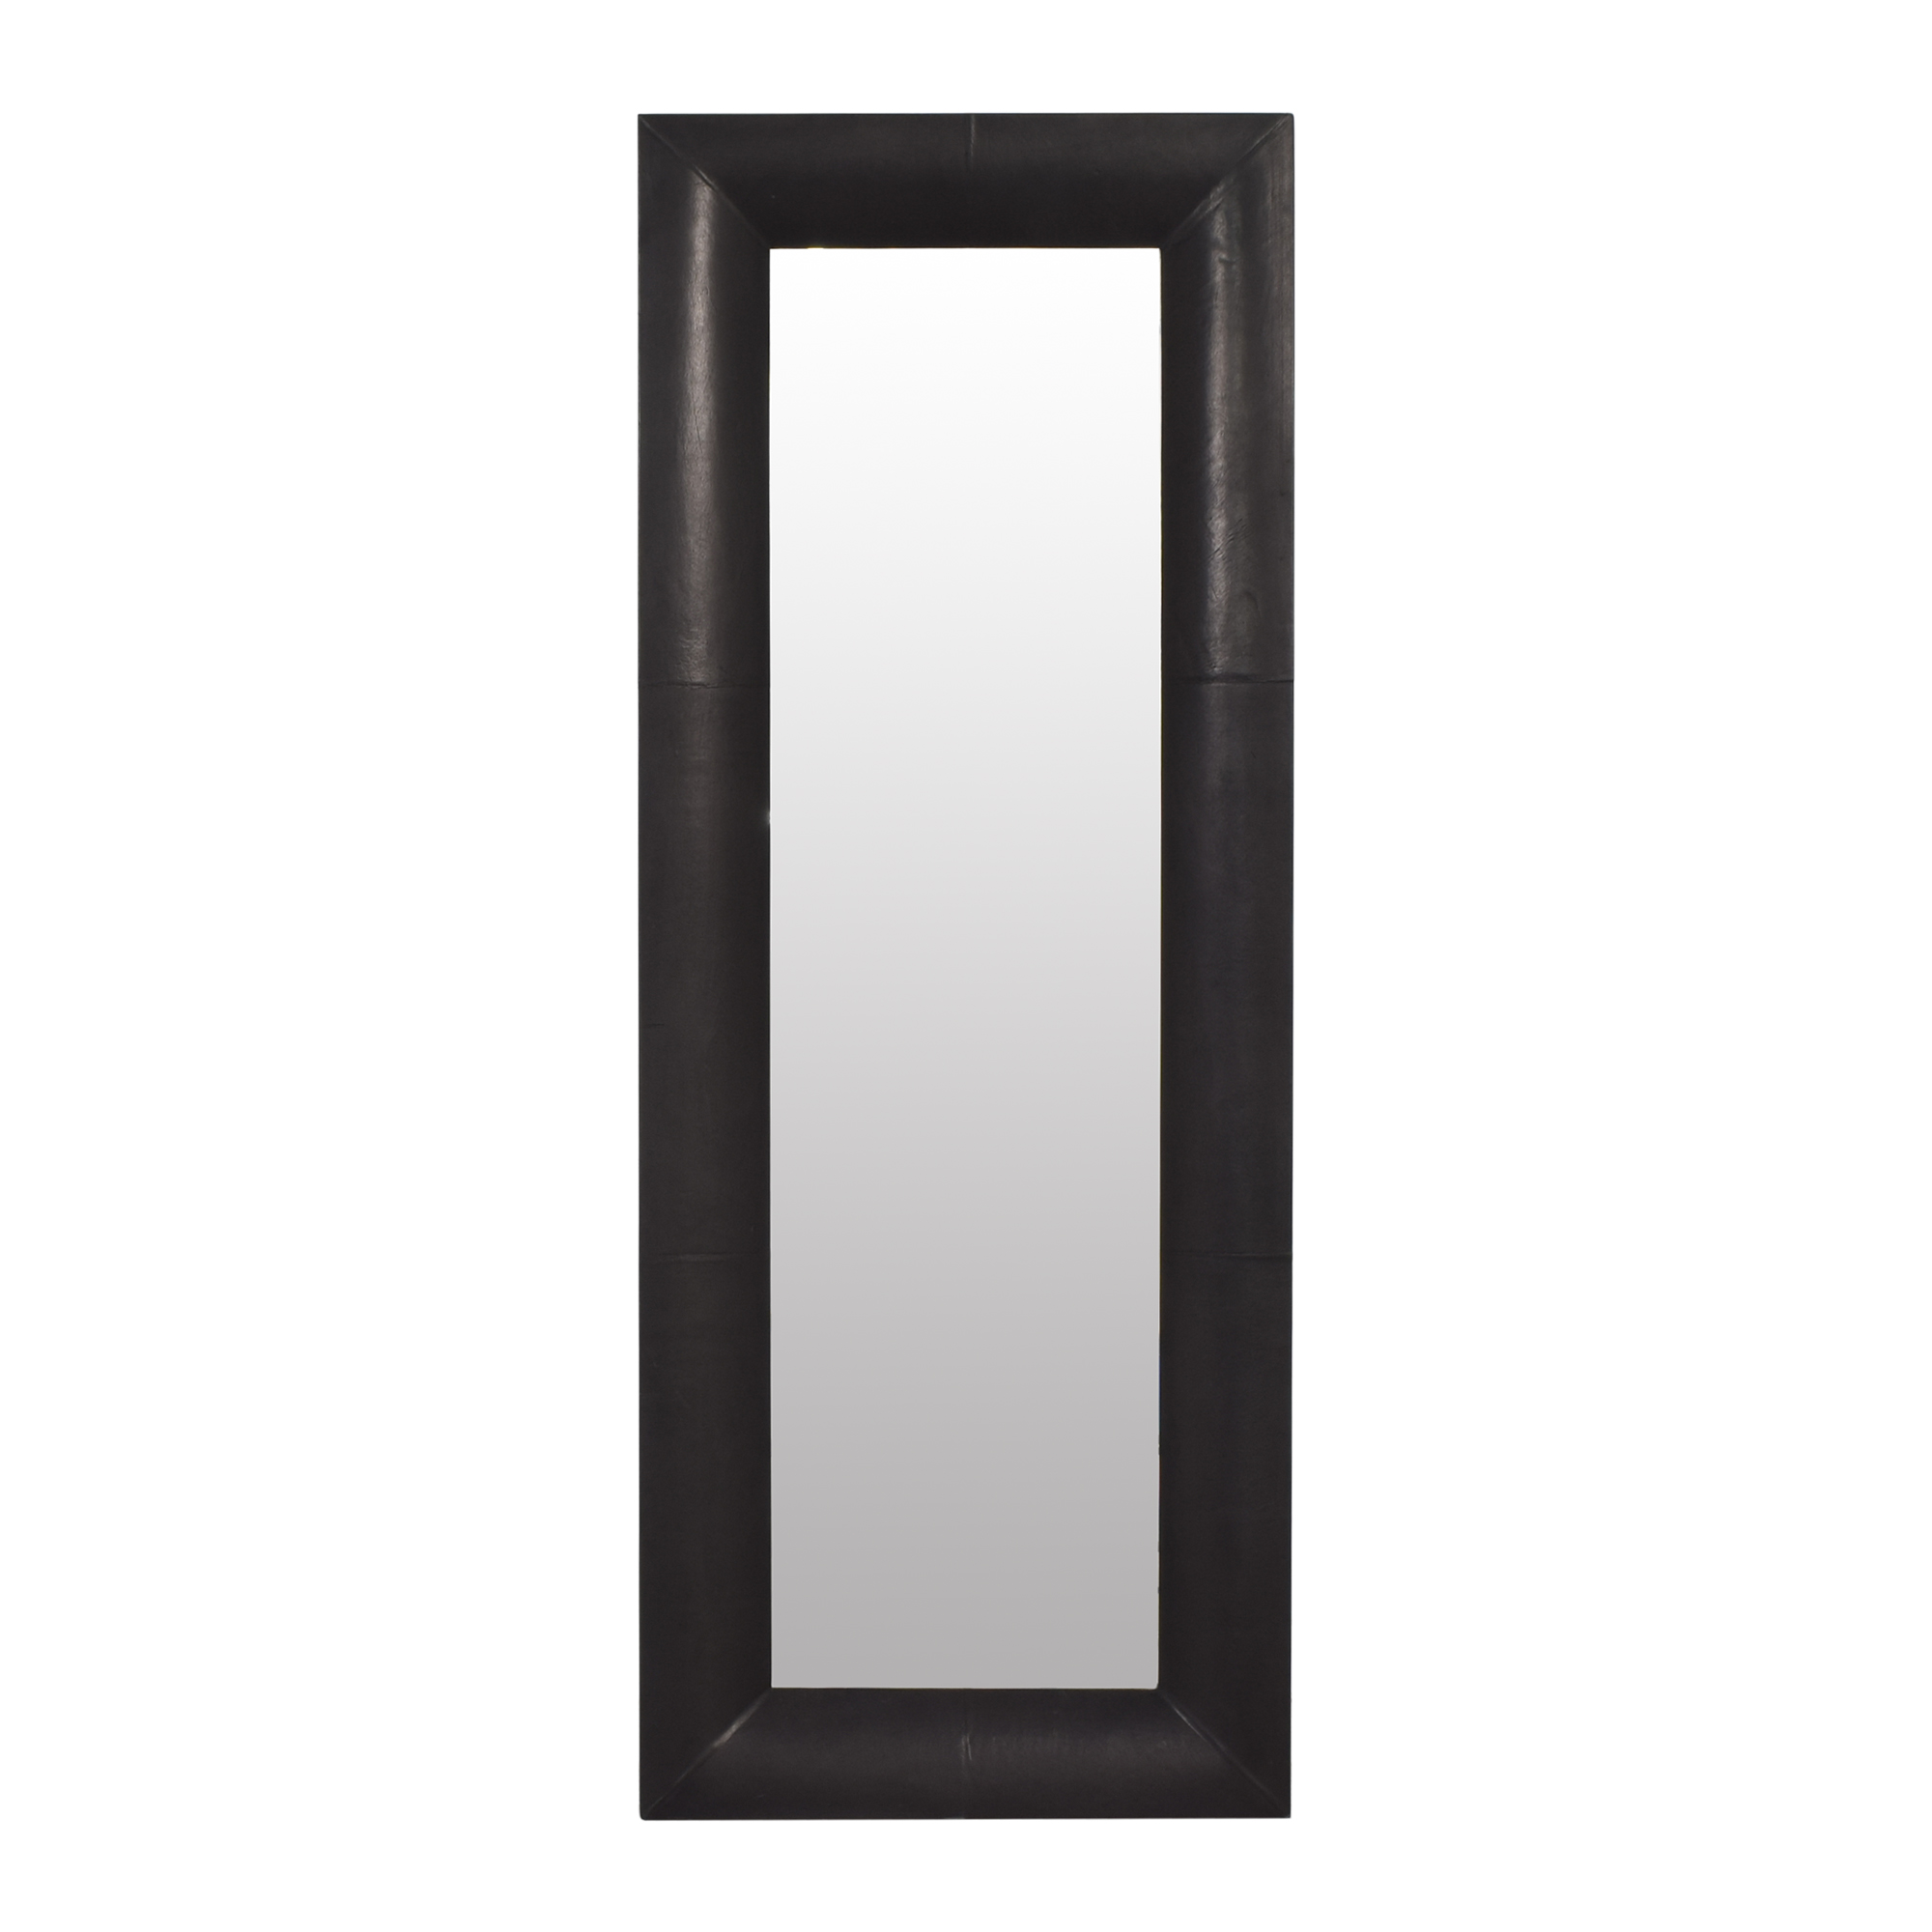 Crate & Barrel Crate & Barrel Floor Mirror nyc